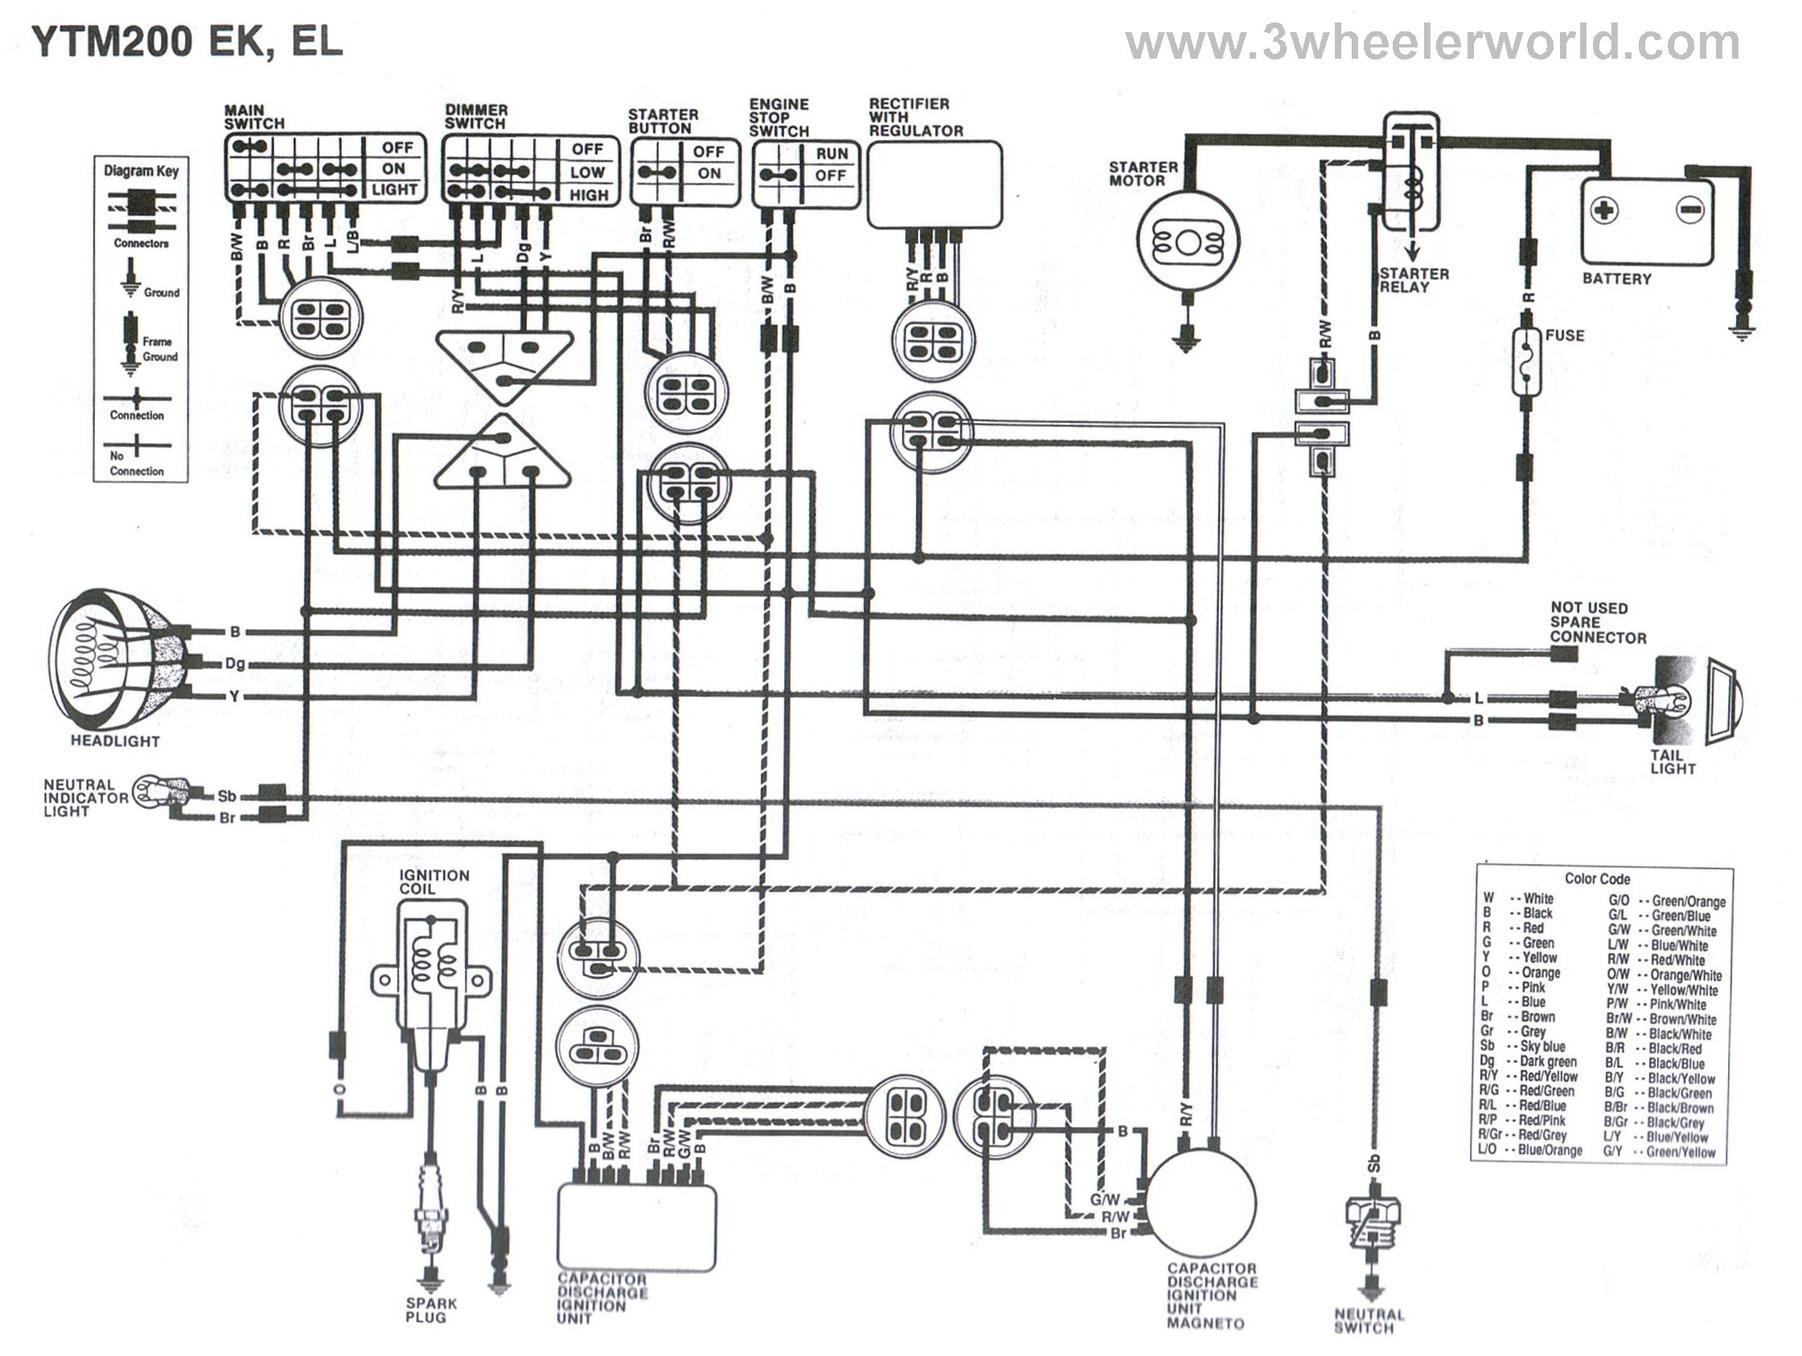 89 winnebago wiring diagram f wiring diagram wiring diagrams, Wiring diagram